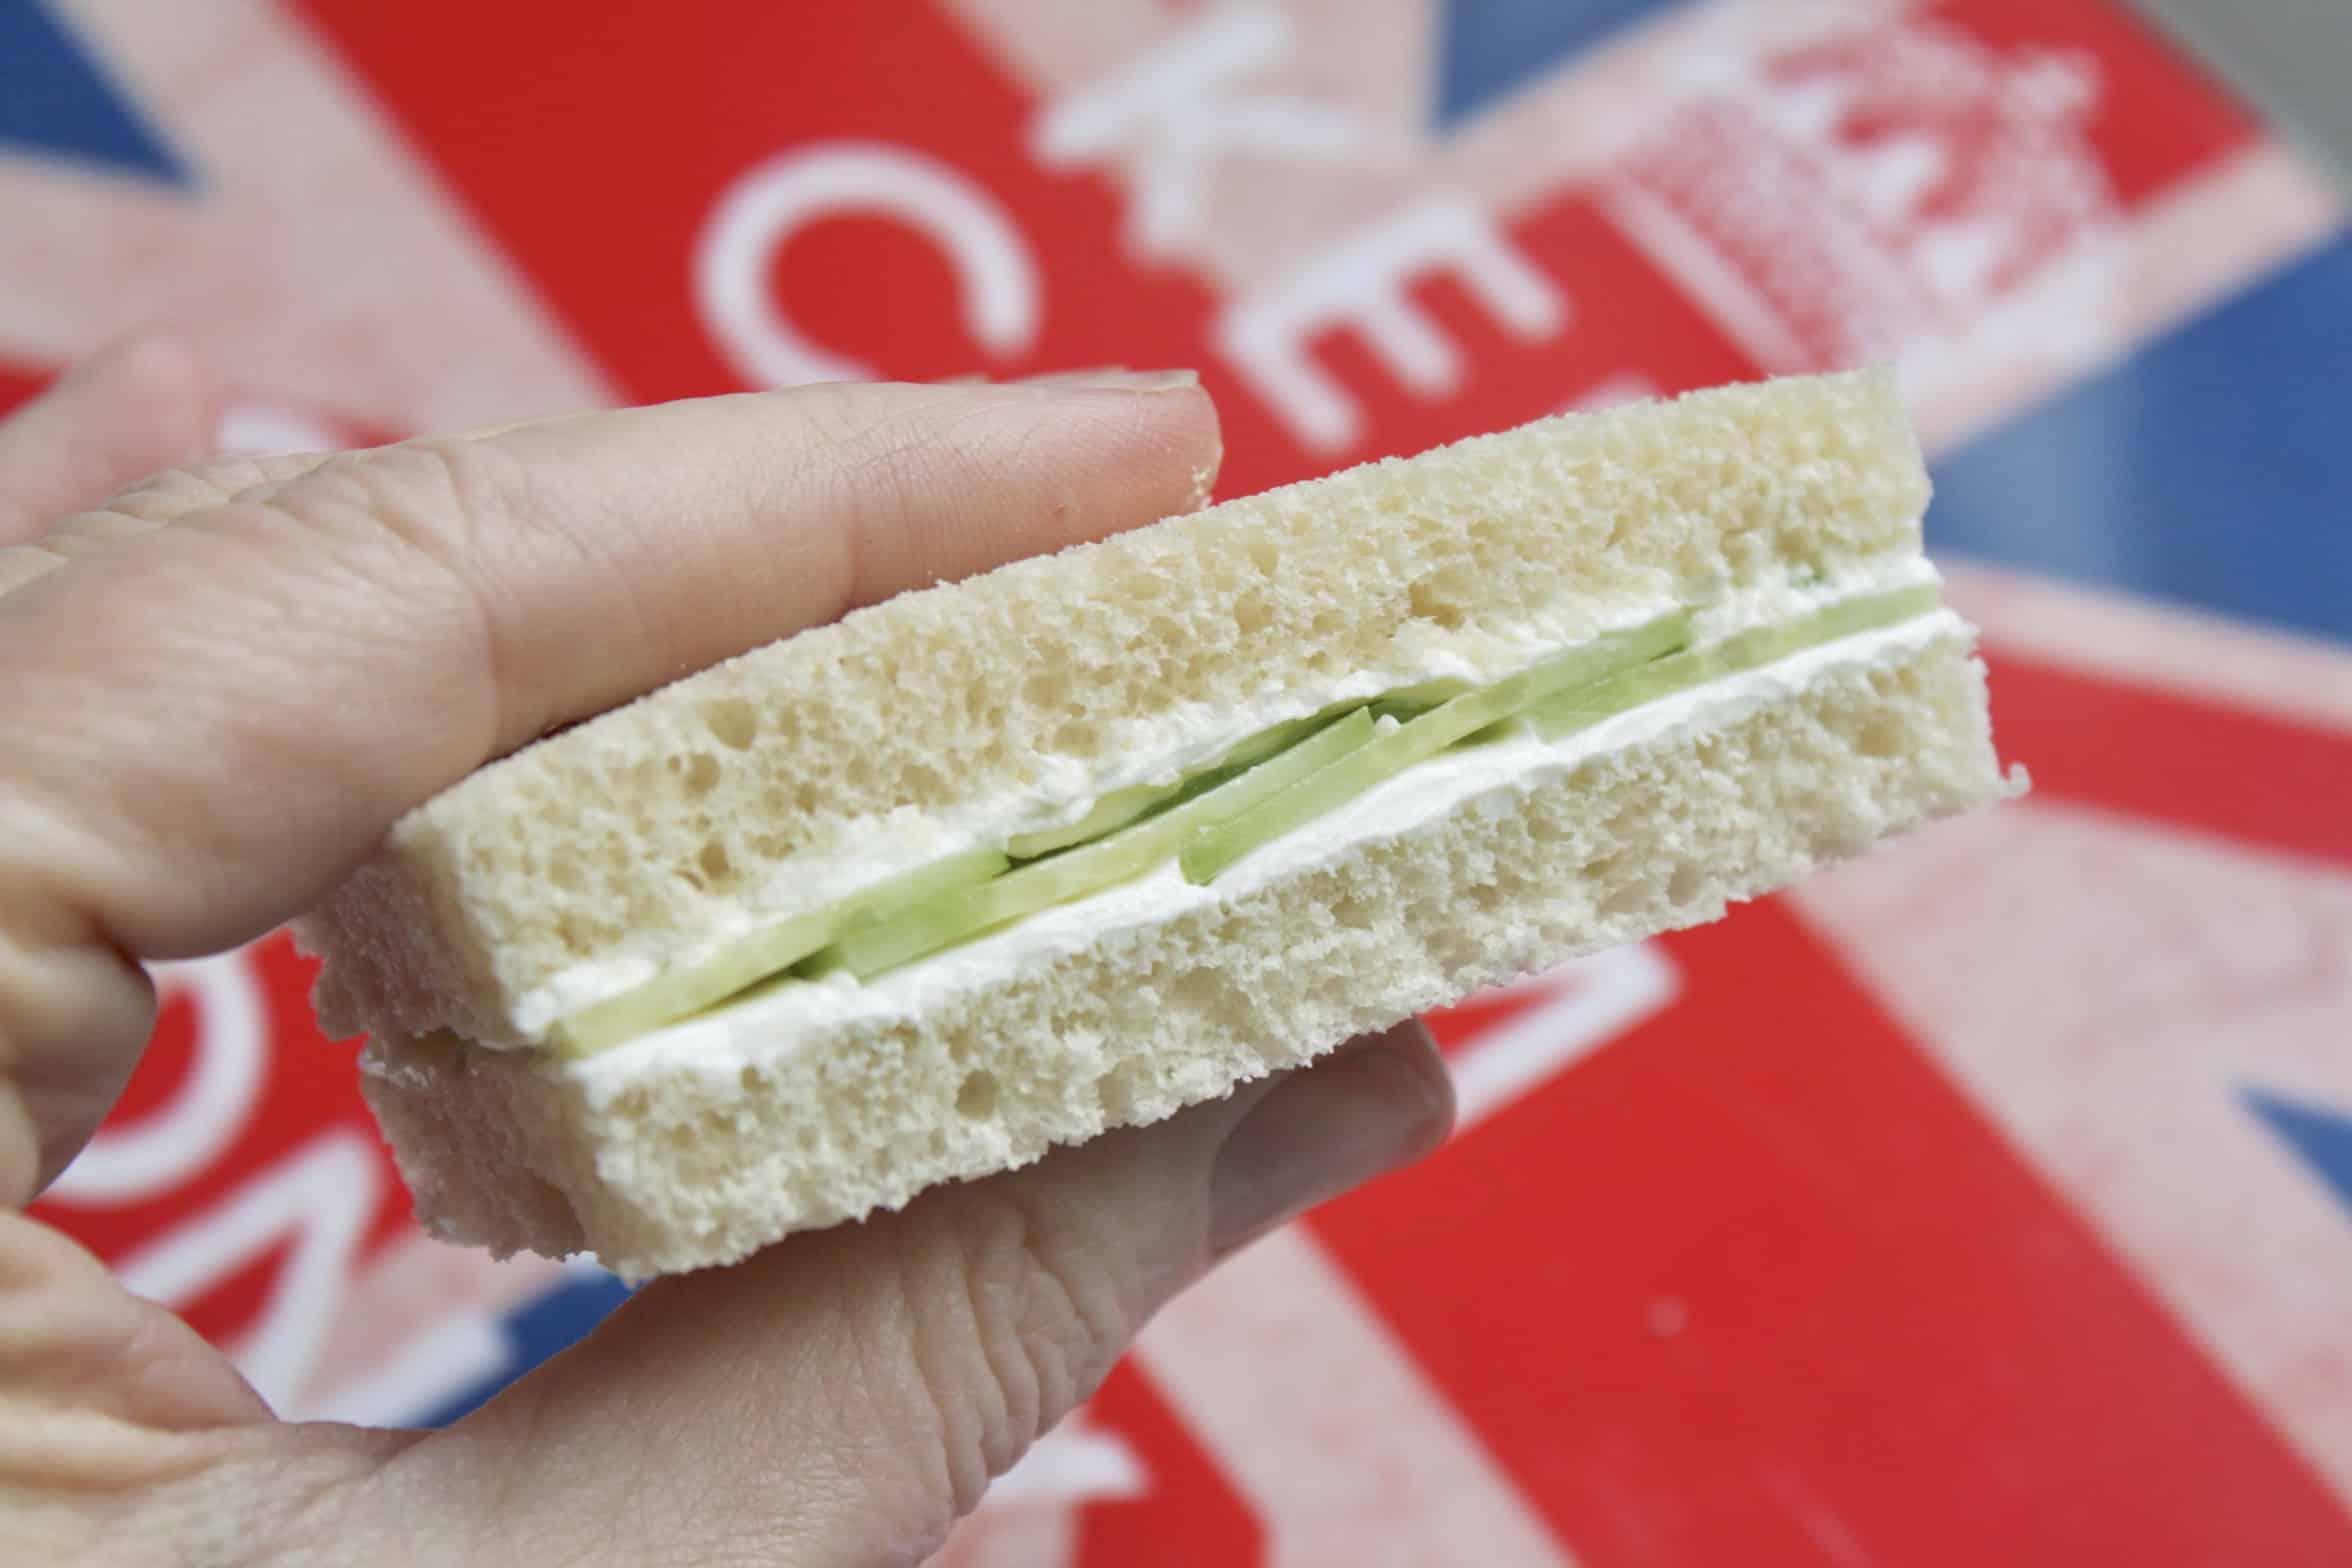 holding a cucumber sandwich